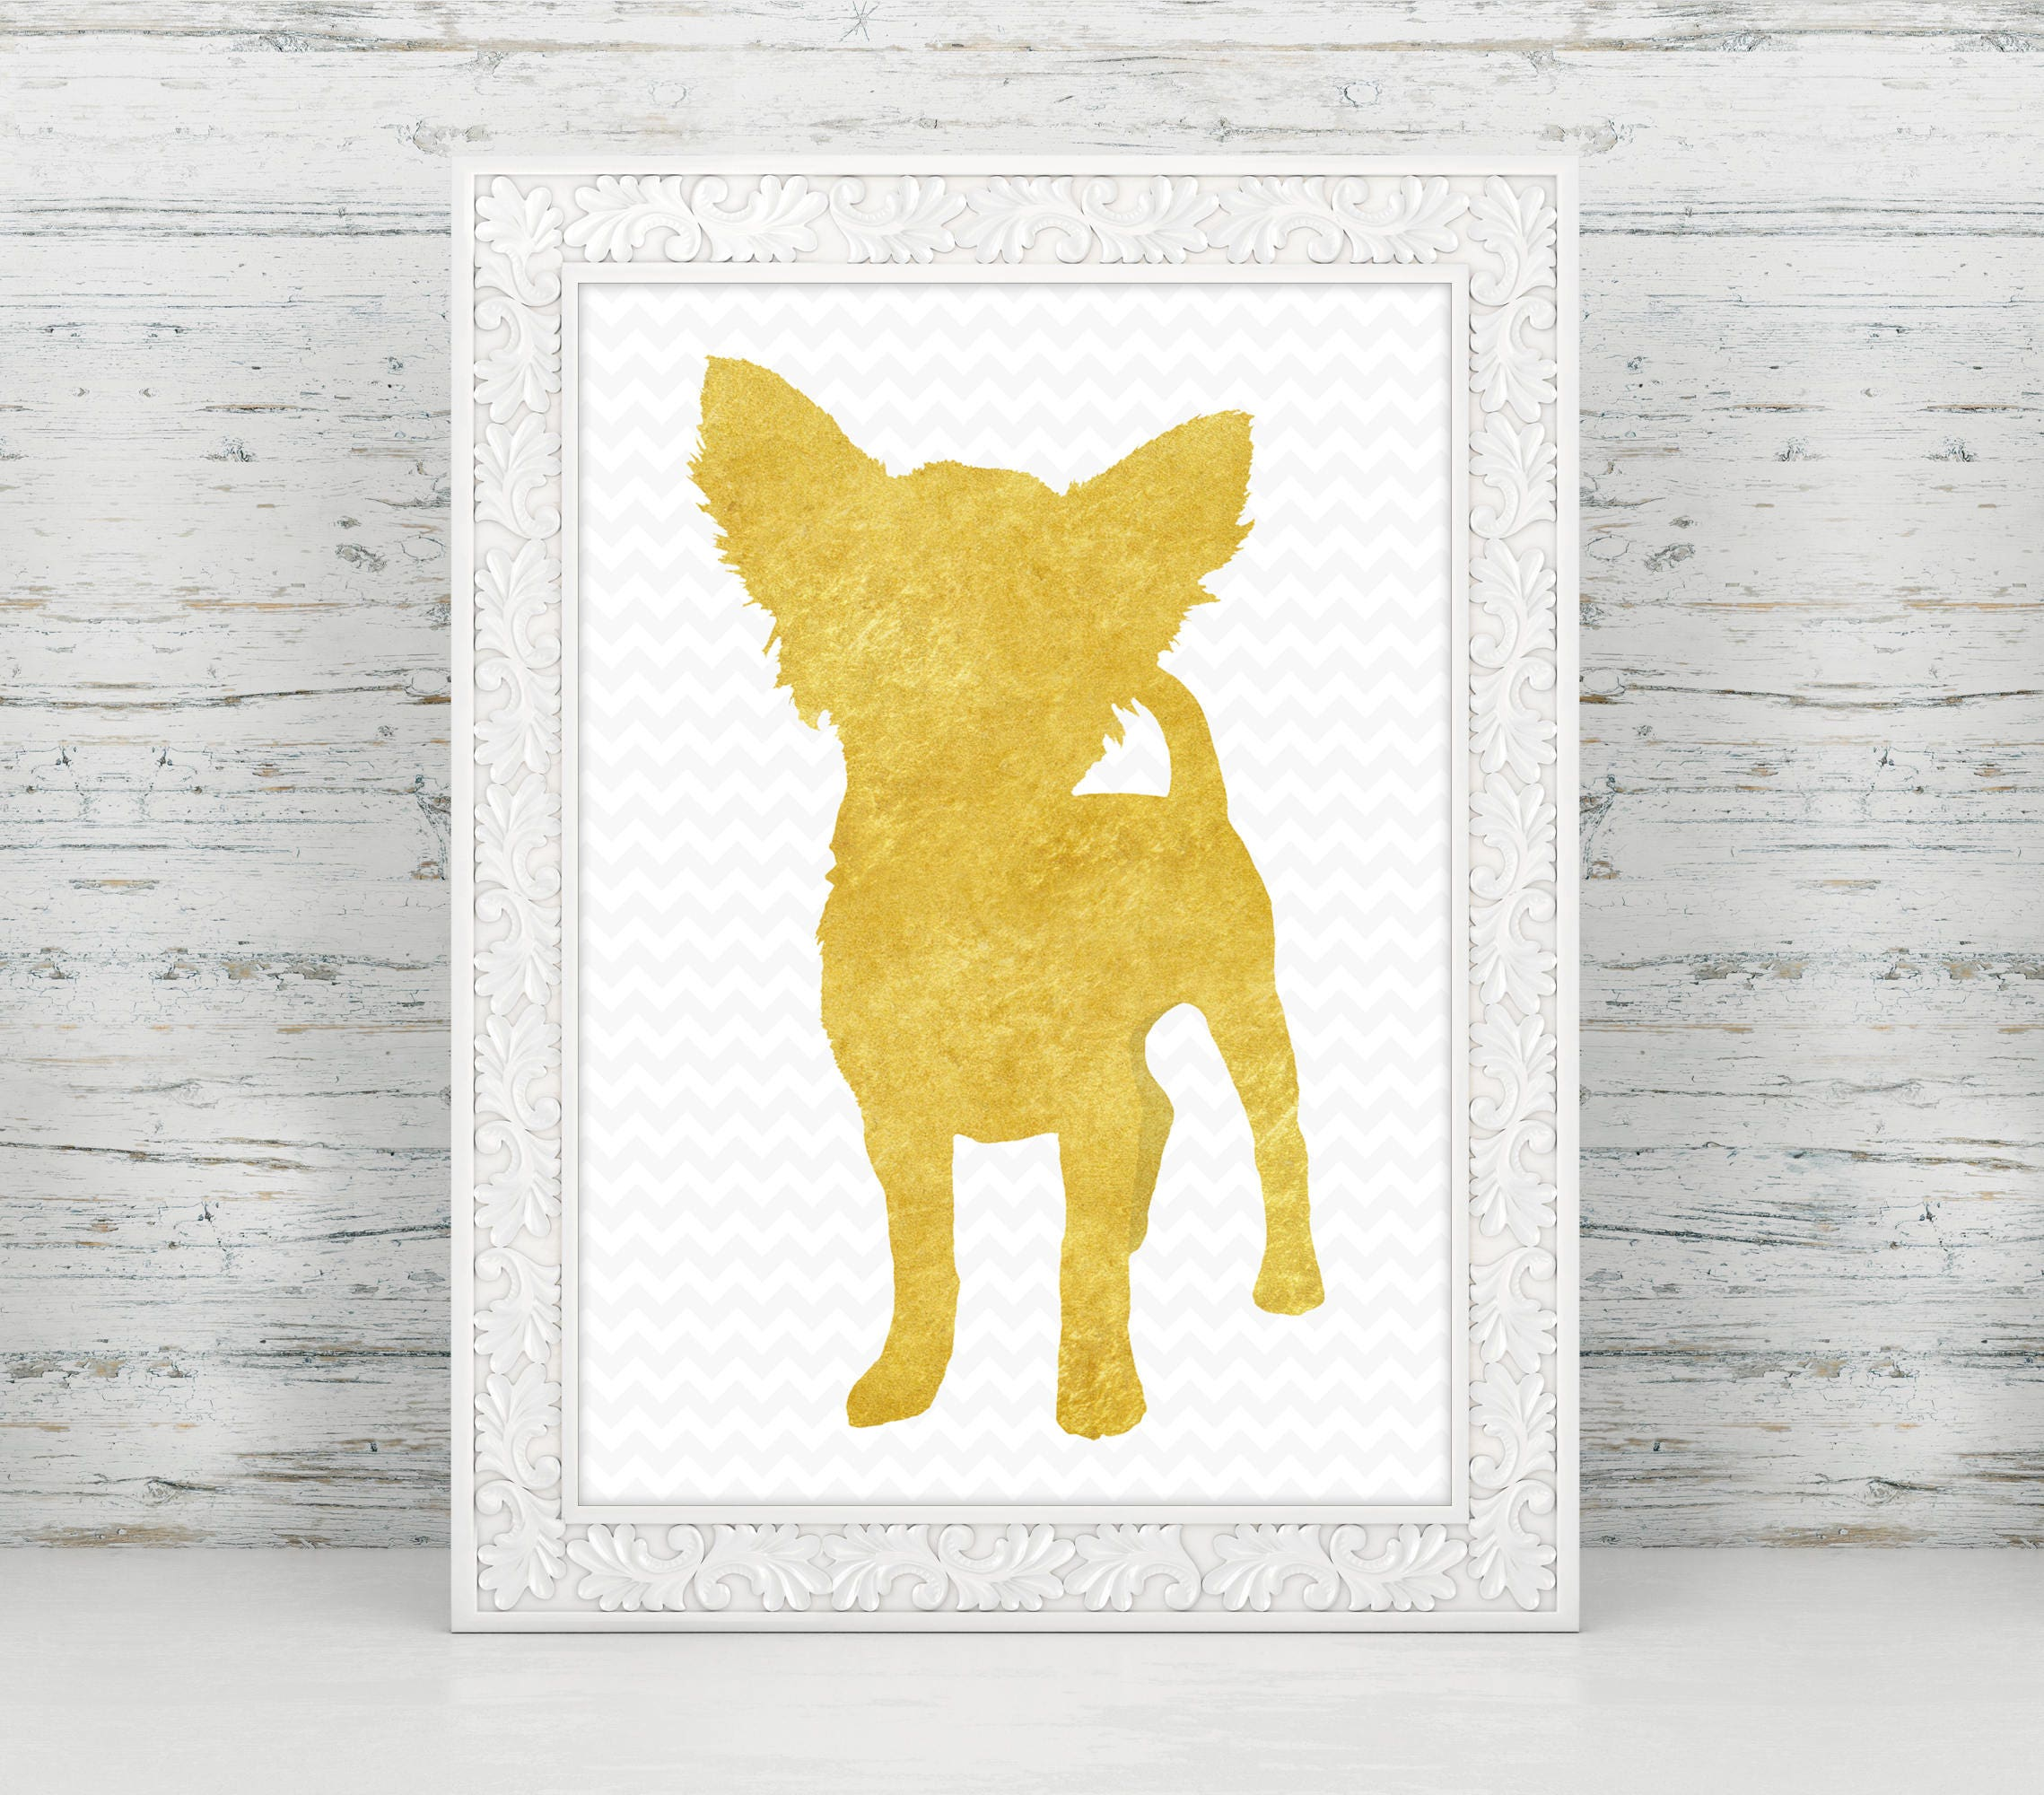 Chihuahua Art / Chihuahua / Chihuahua Print / Chihuahua Gifts